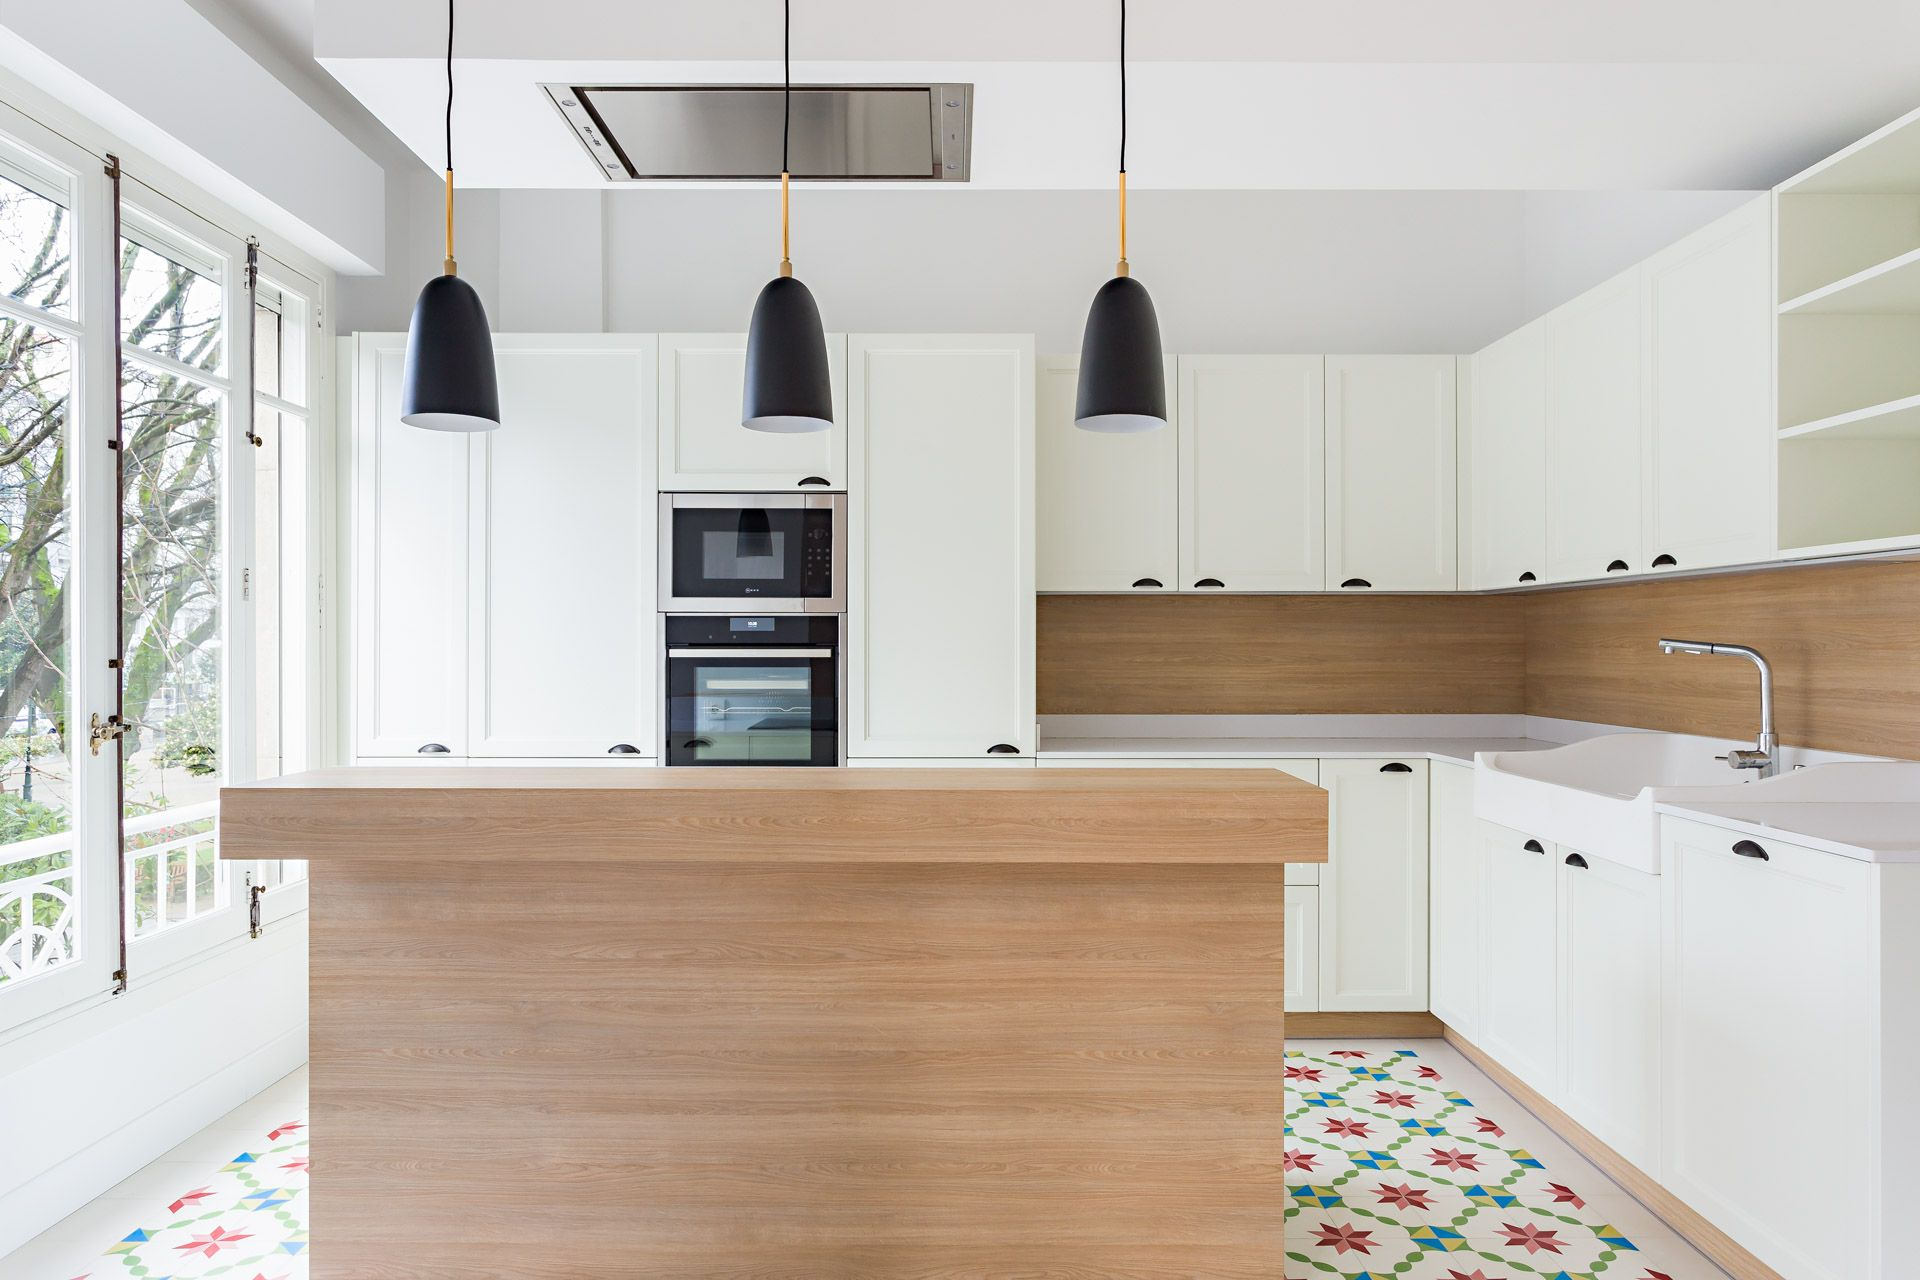 Abracadabra Decor Vigo Home Staging Compostela reforma integral de vivienda - cocina